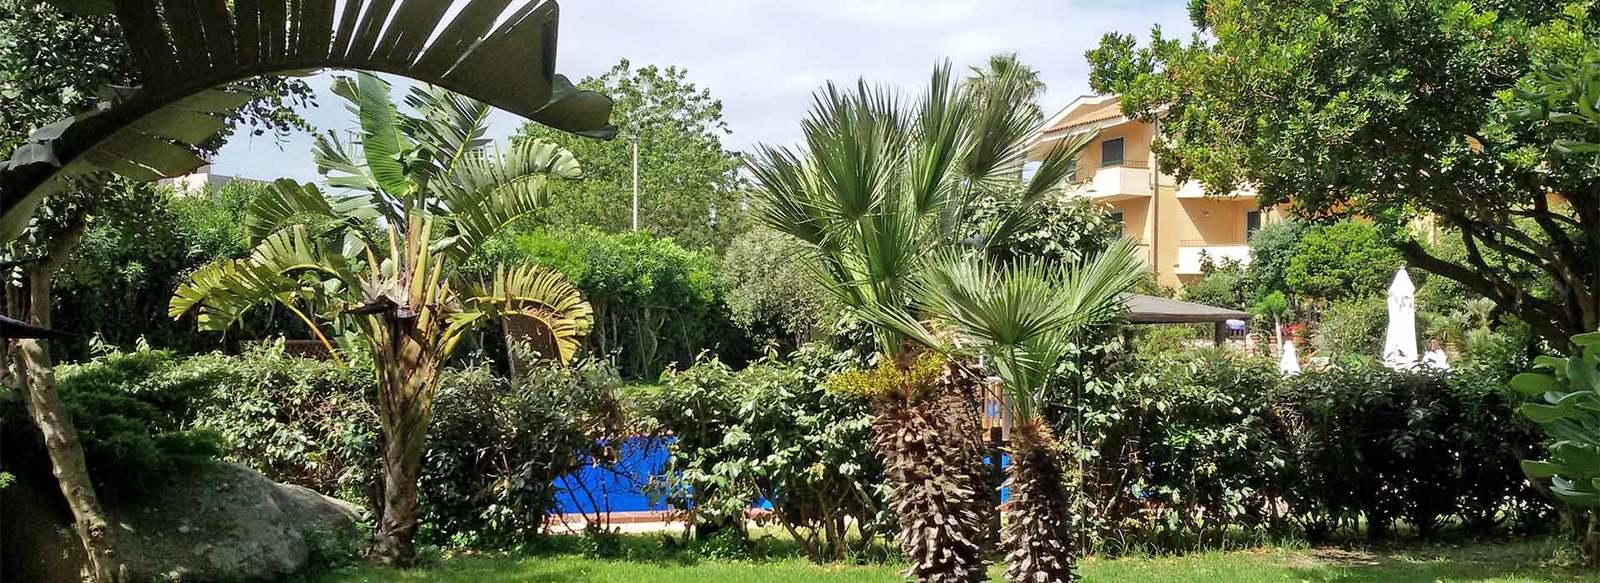 Vacanze in famiglia in Gallura